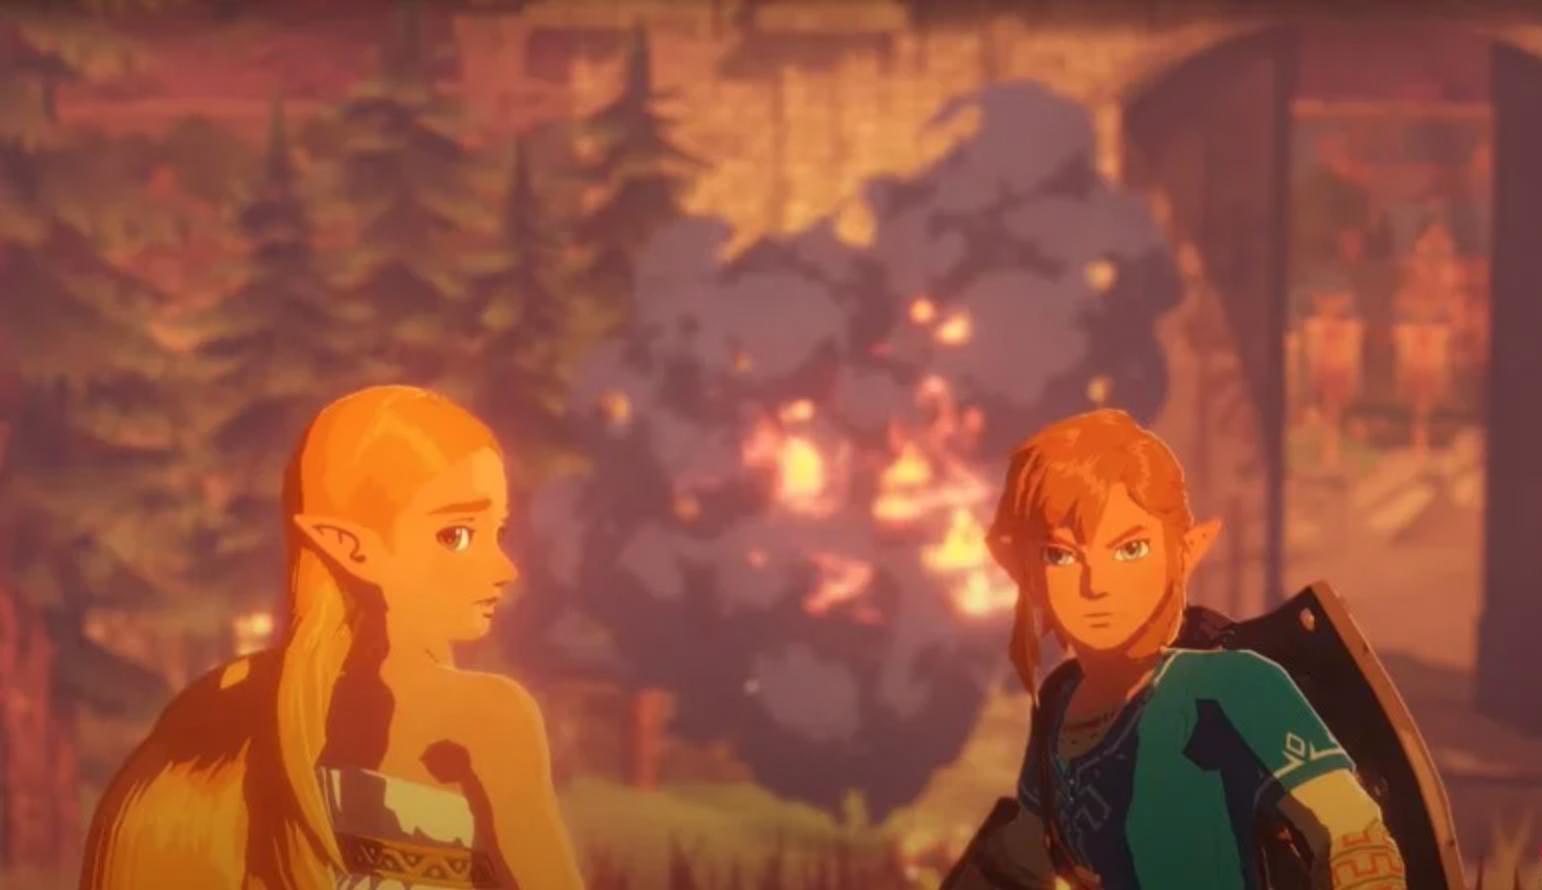 Pin On The Legend Of Zelda